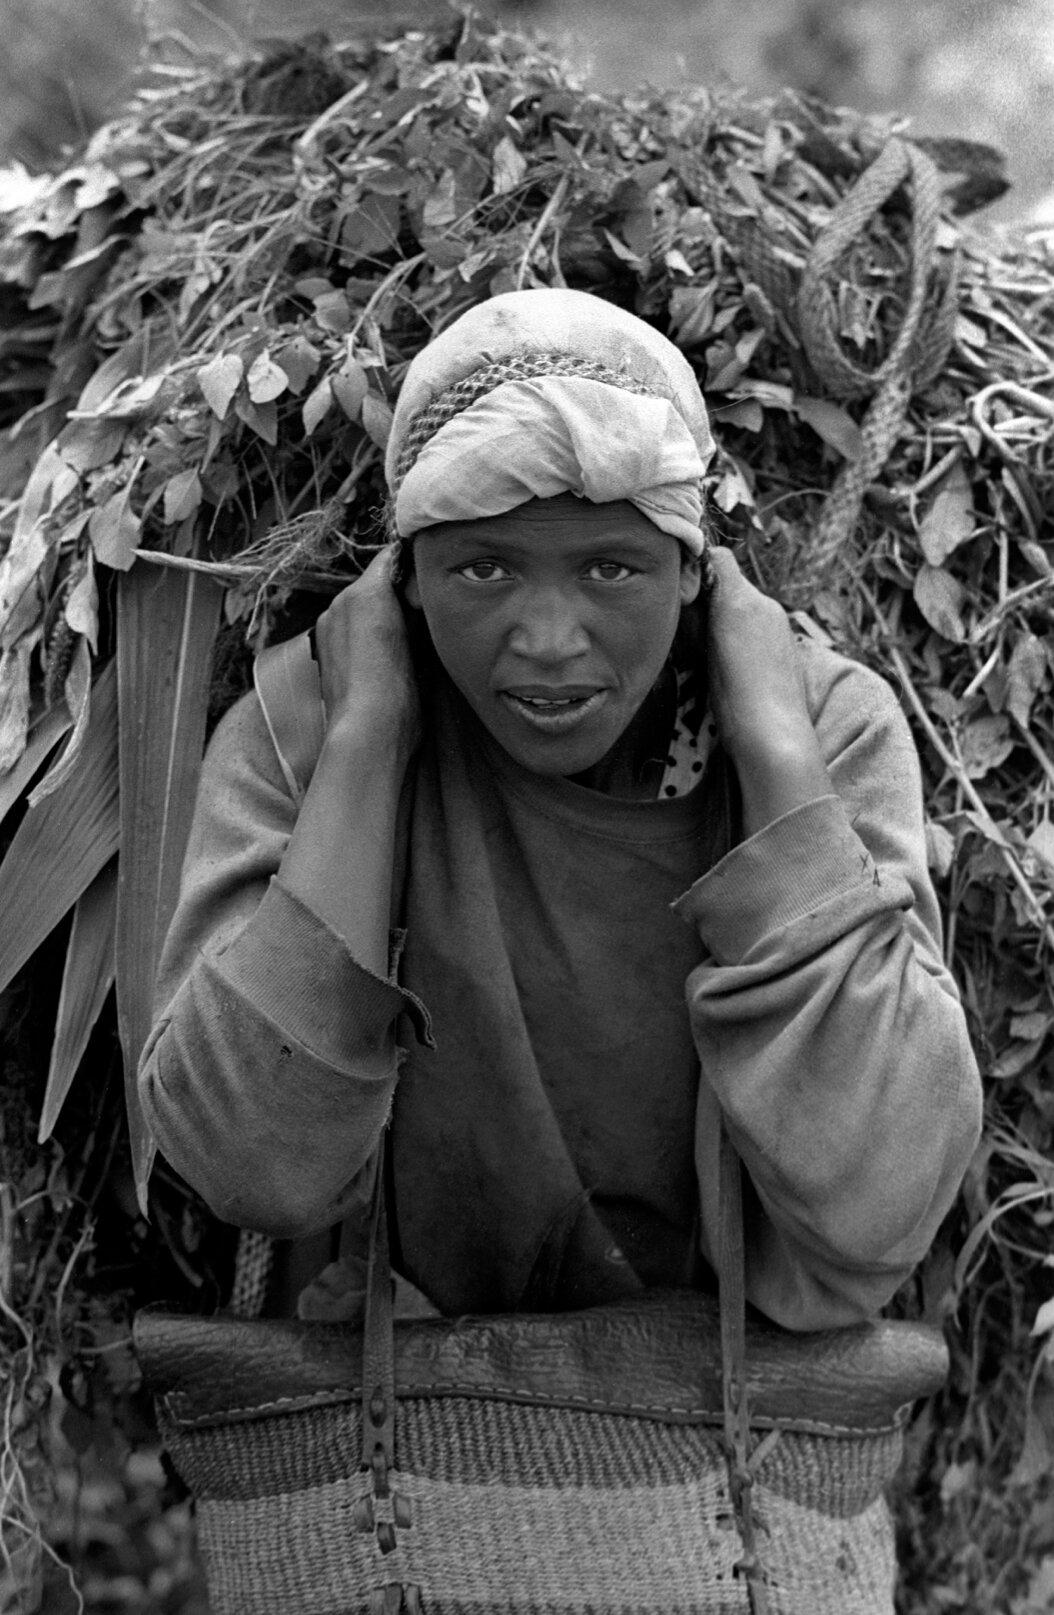 Kikuyu teen, Limuru District, Kenya, 1989